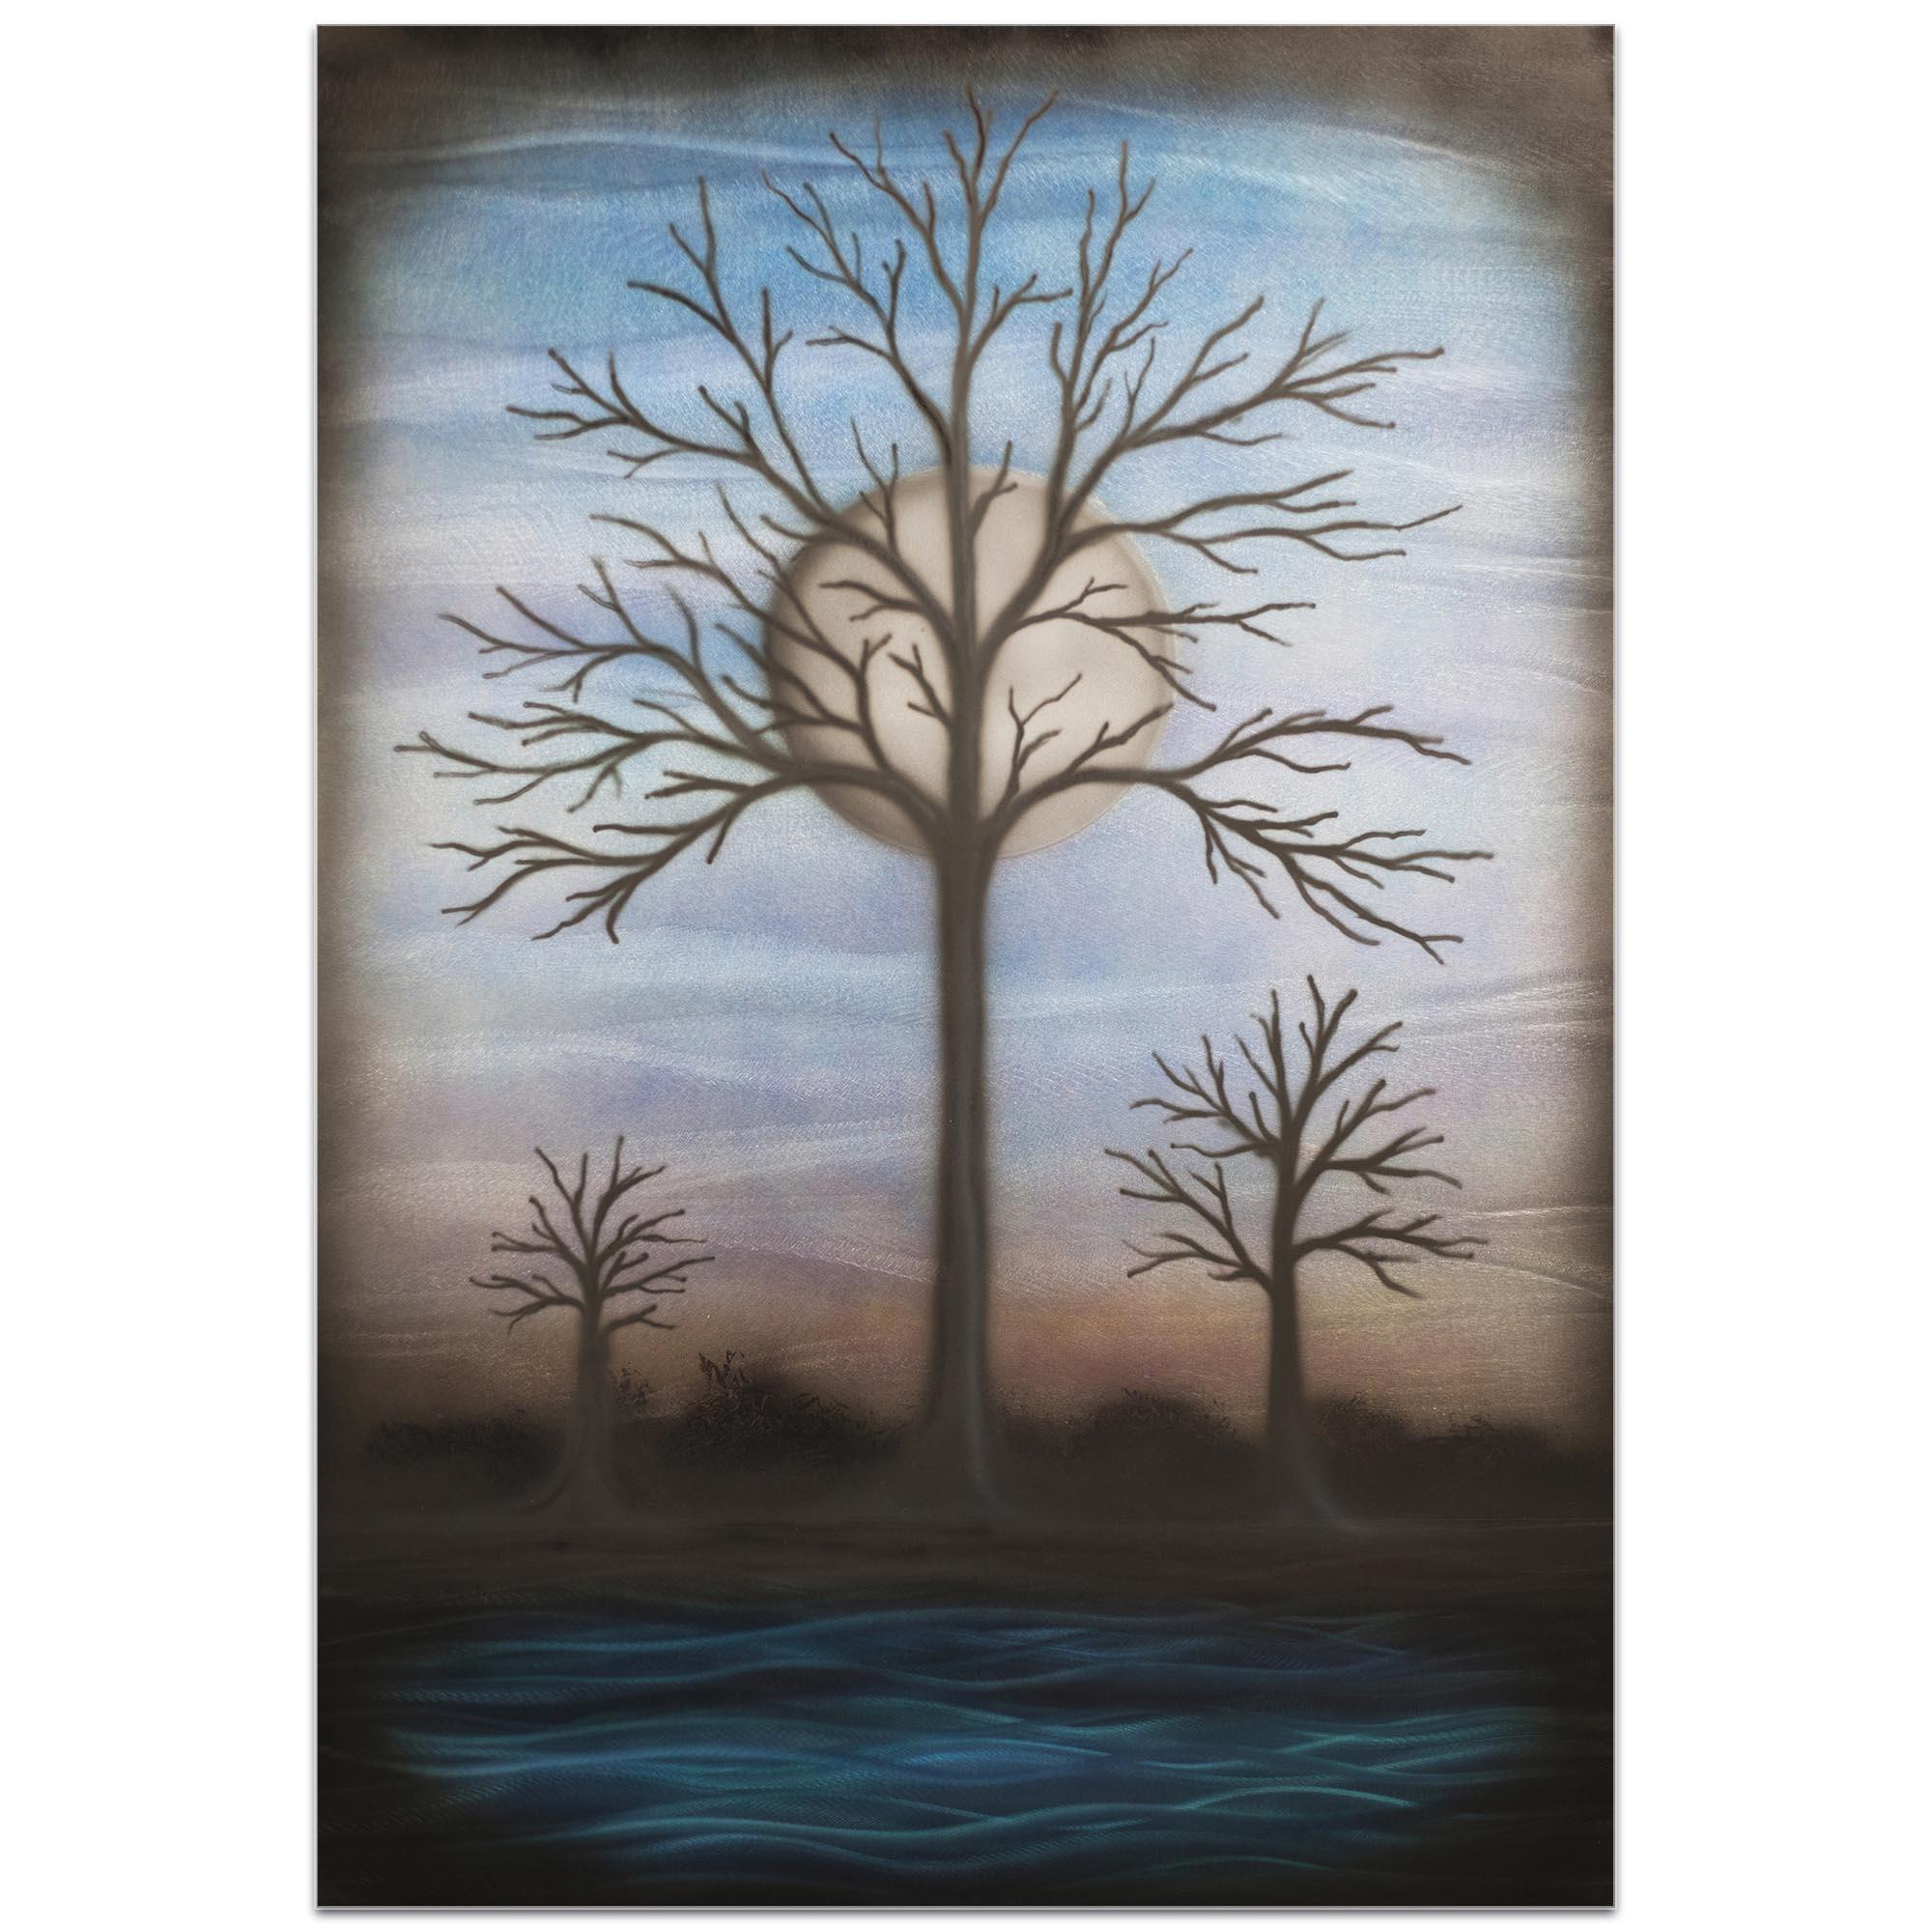 Contemporary Wall Art 'Full Moon' - Bare Trees Decor on Metal or Plexiglass - Image 2